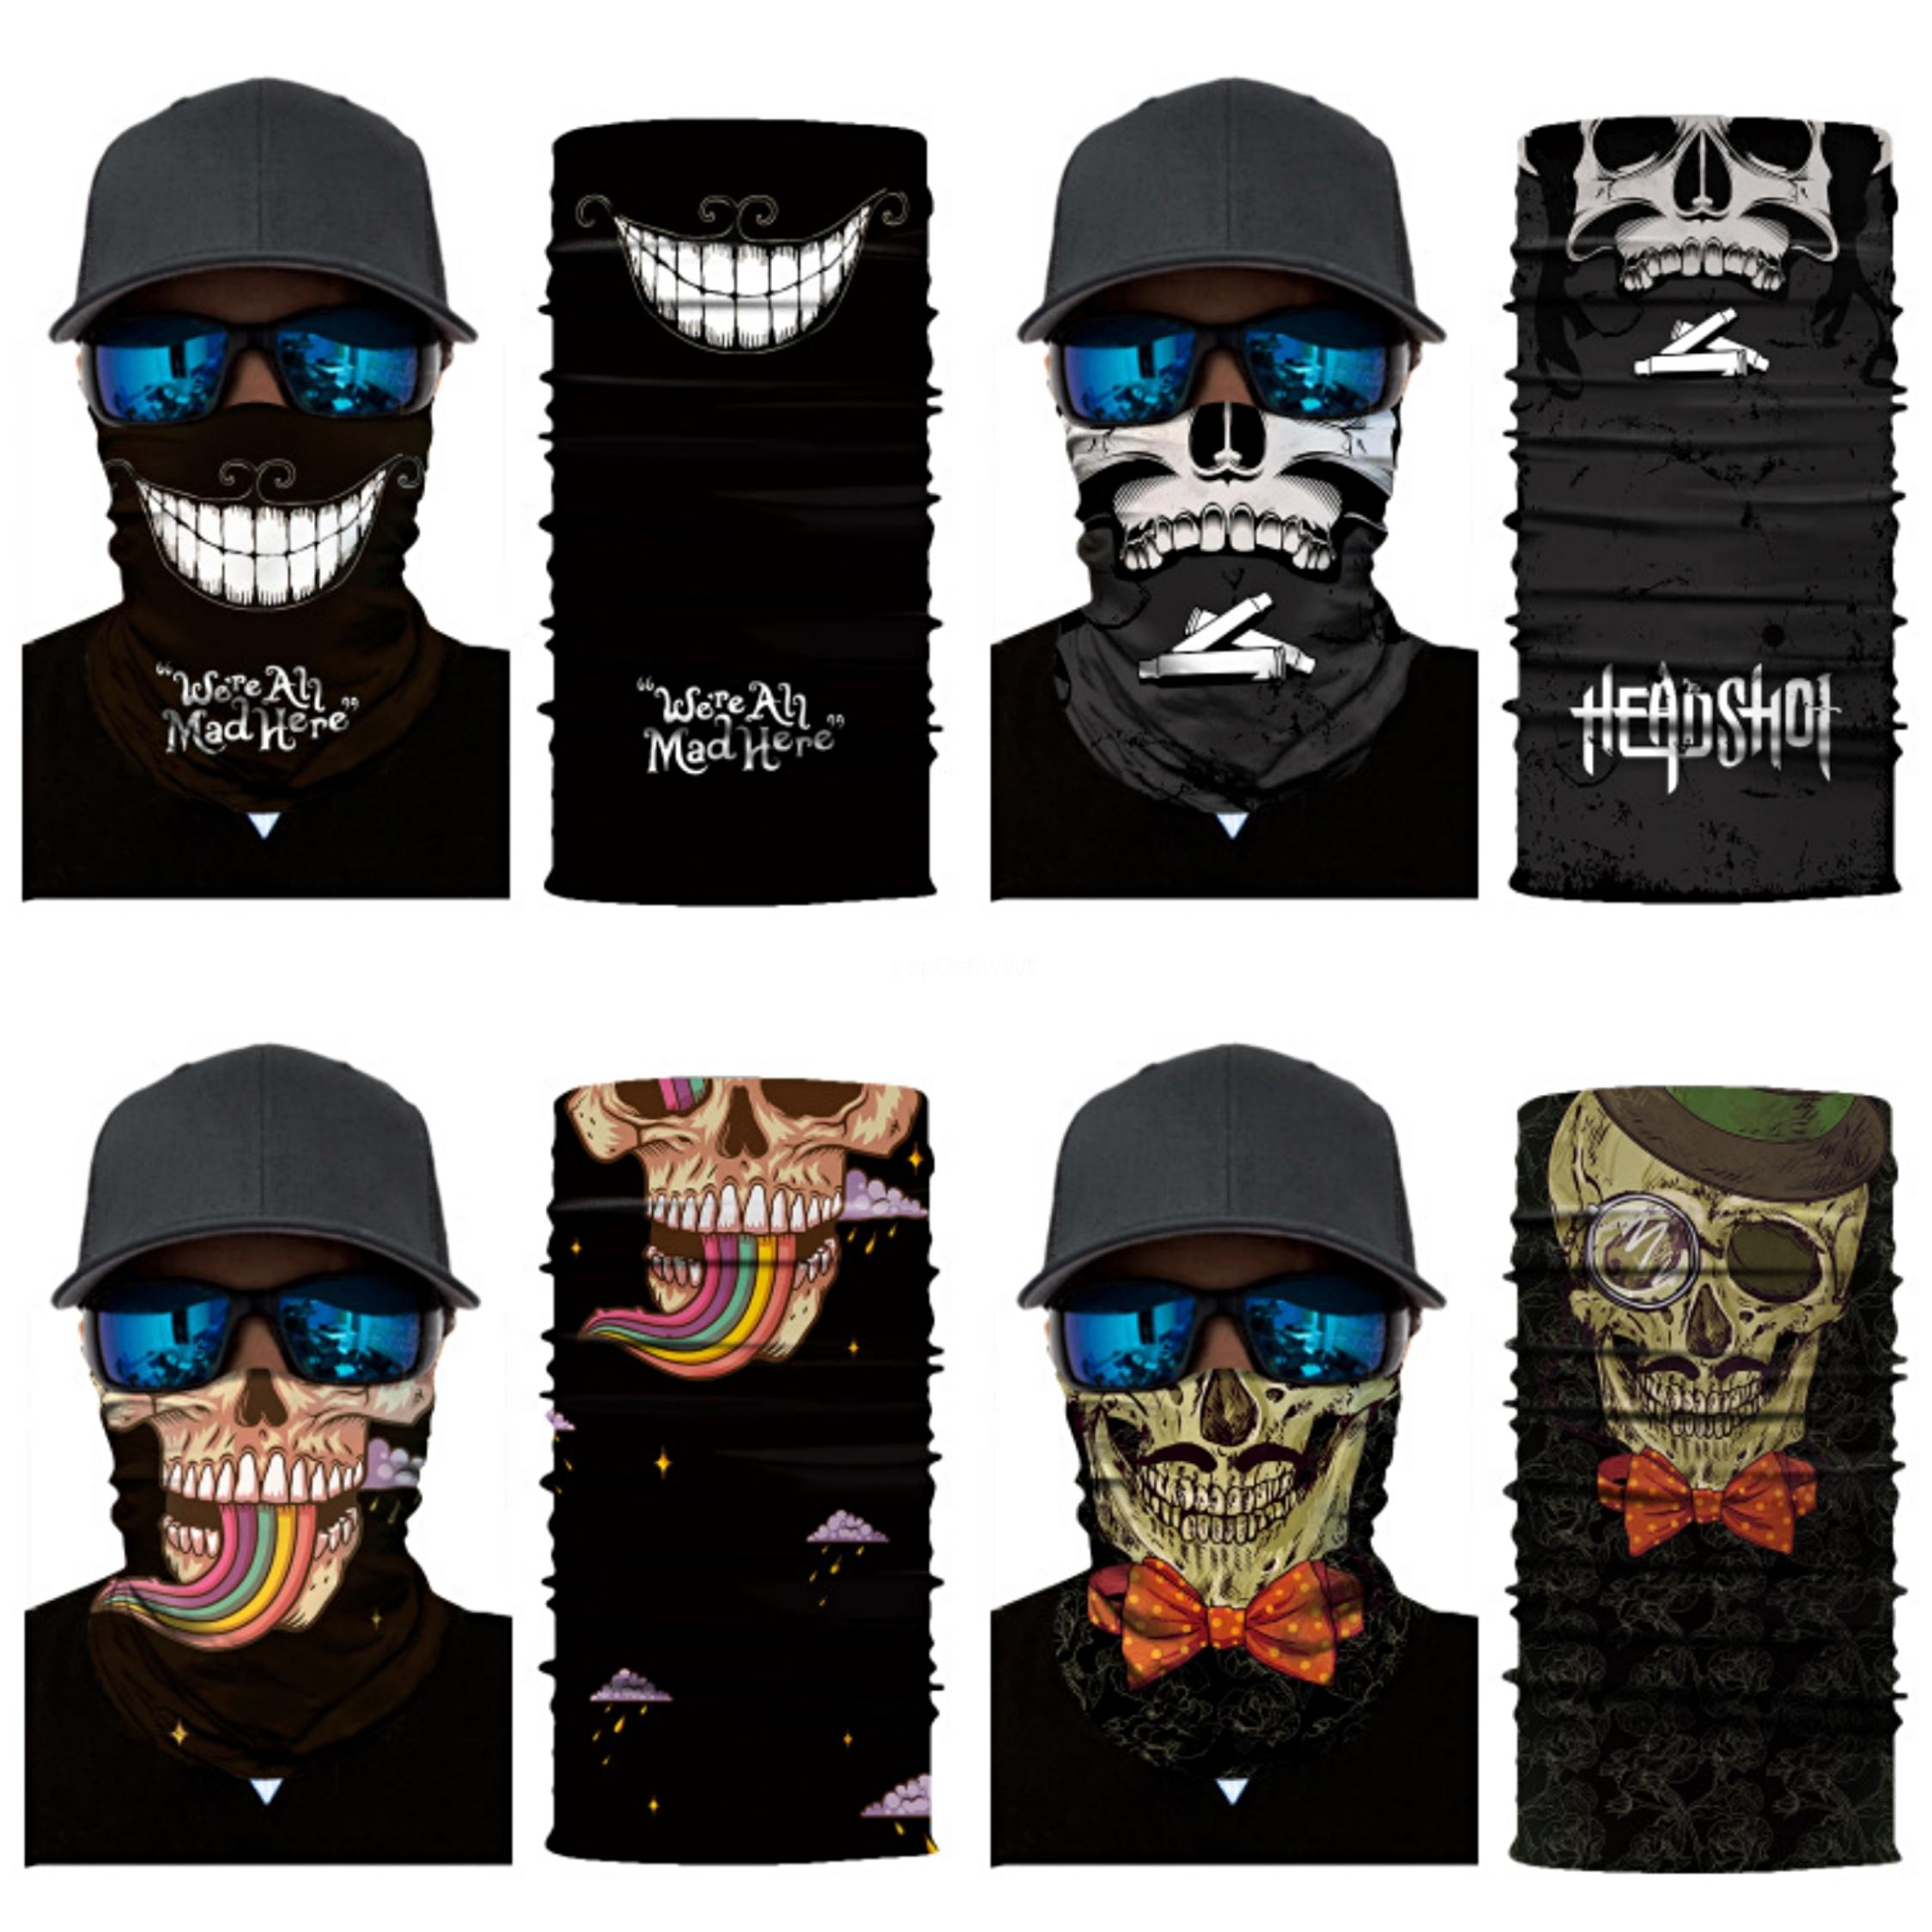 S7GAD Pirate Bicycle Halloween Skull Magic Skull Scarf Cycle Mask Mask Men Women CS Disguise Bandana Riding Equipment Half Face Face Skul#192